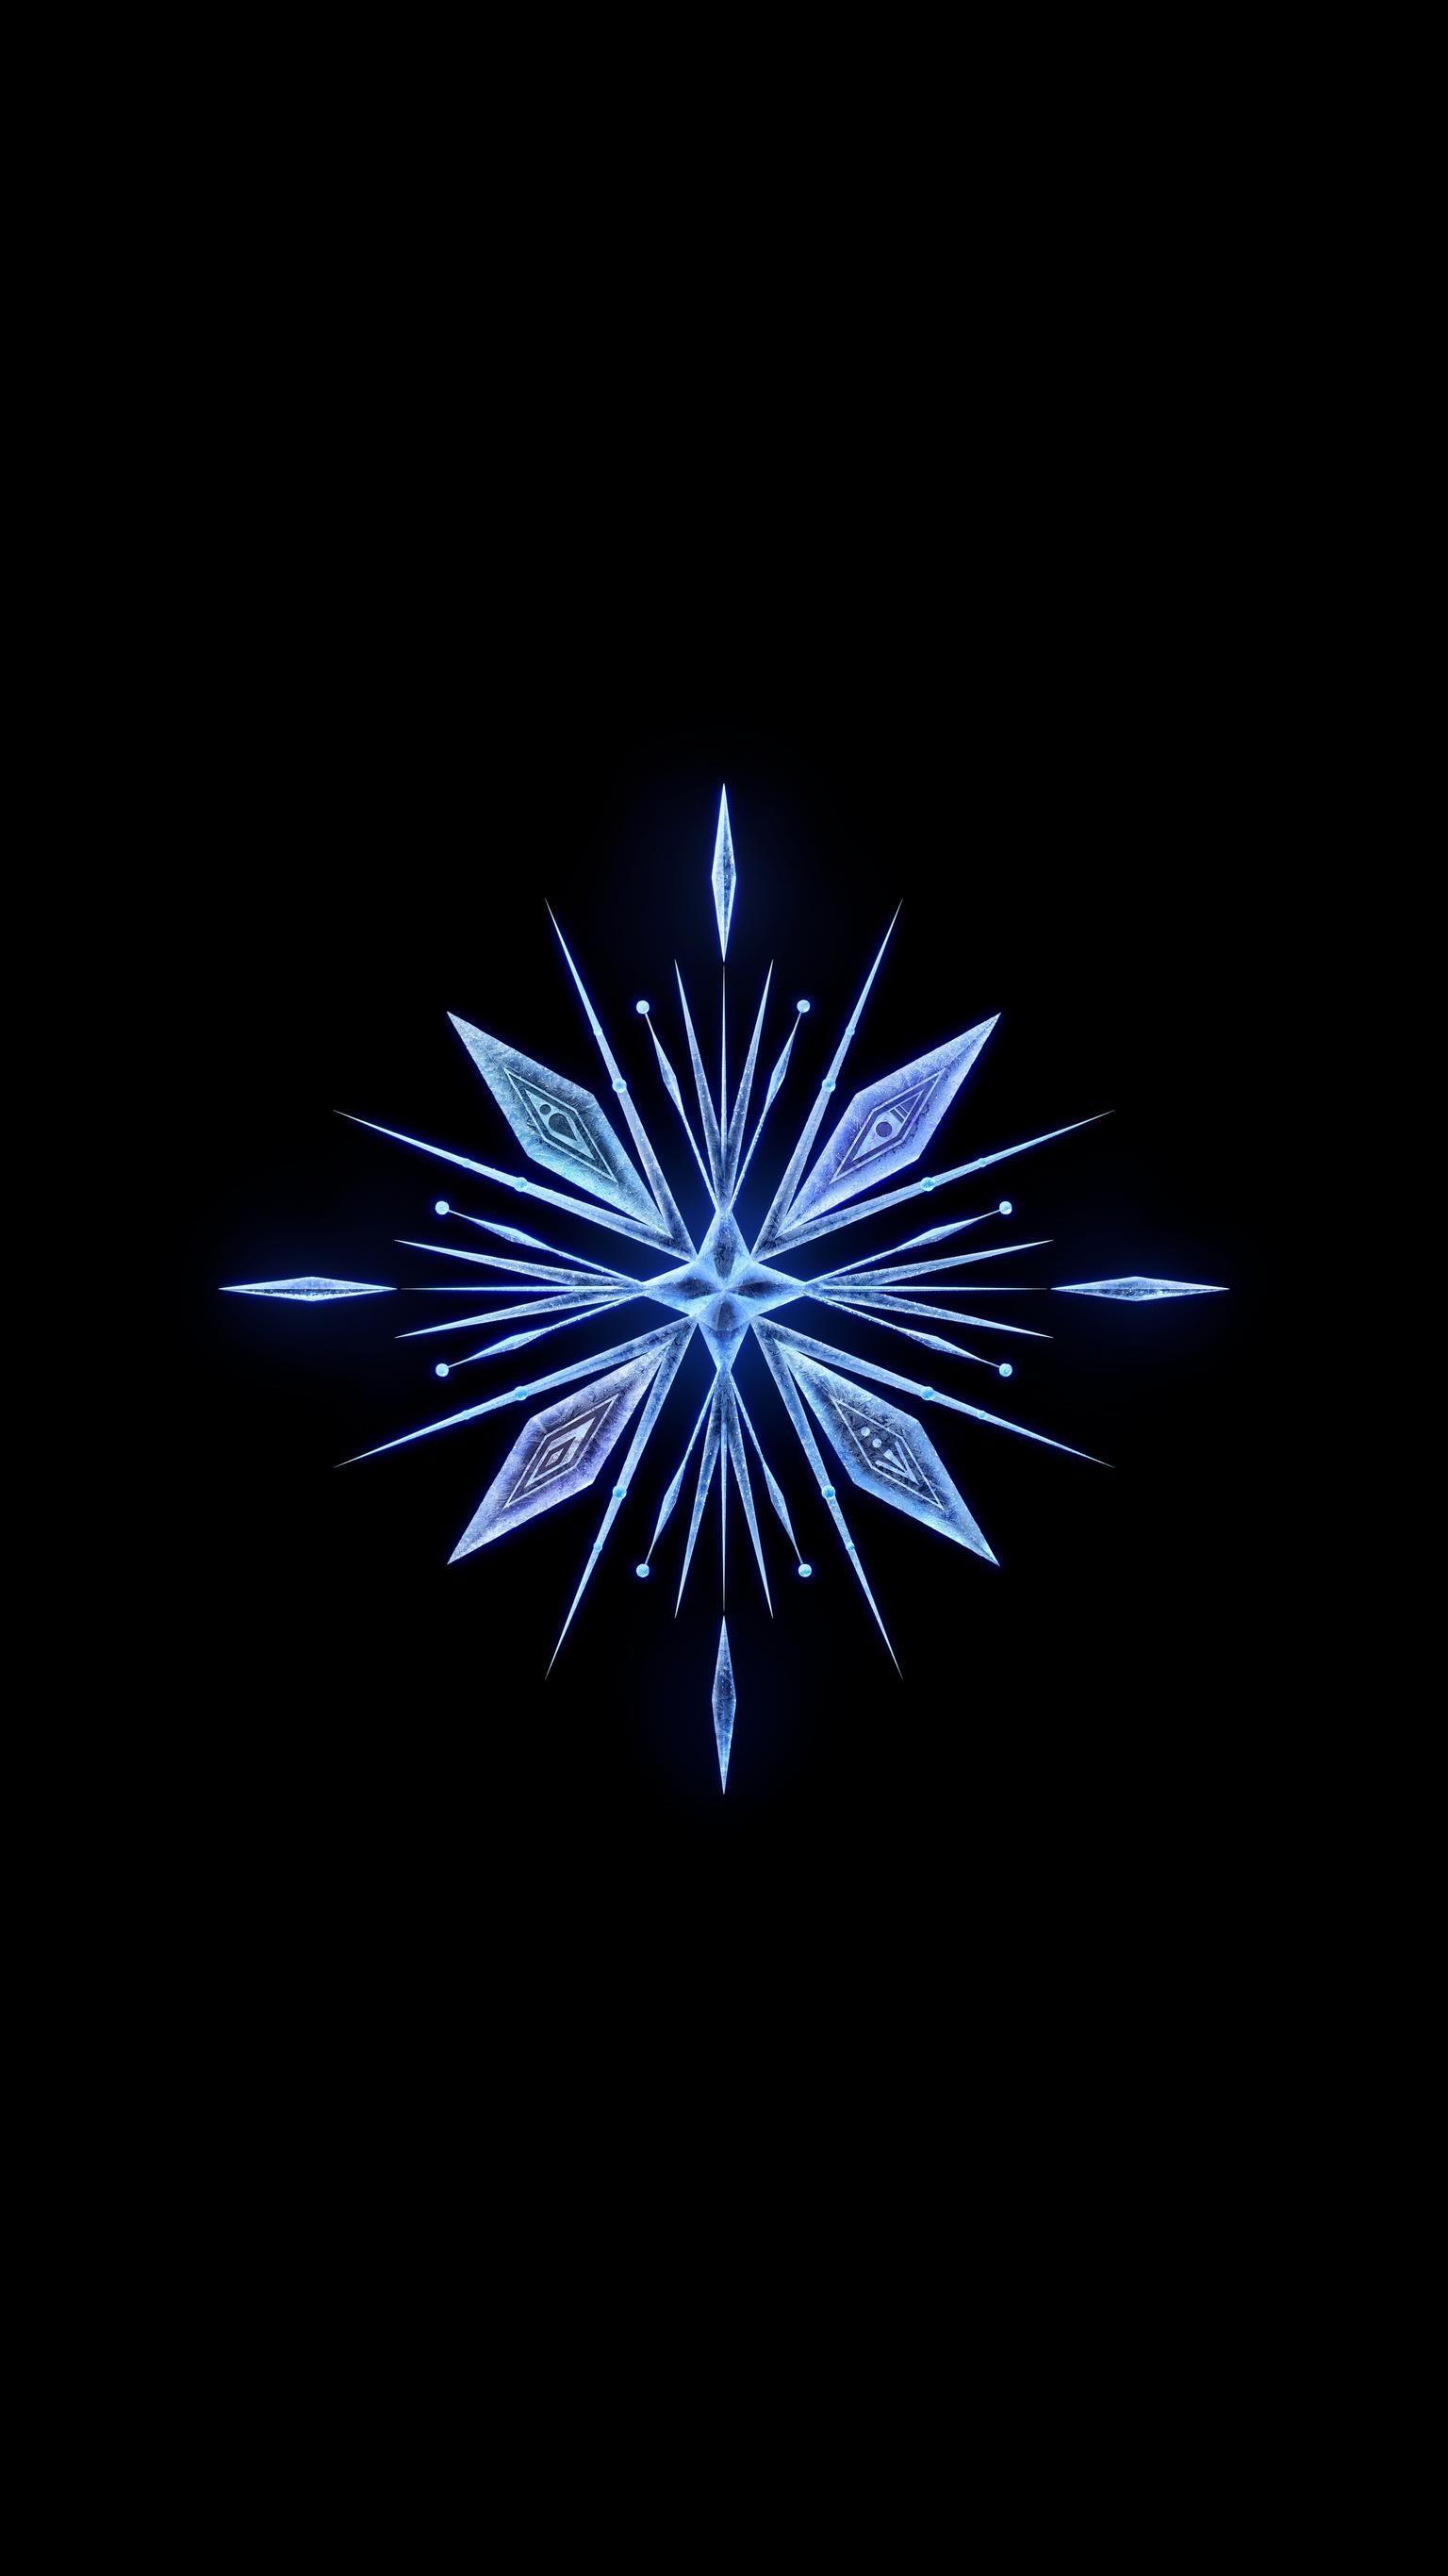 Frozen Logo Wallpapers   Top Frozen Logo Backgrounds 1536x2732